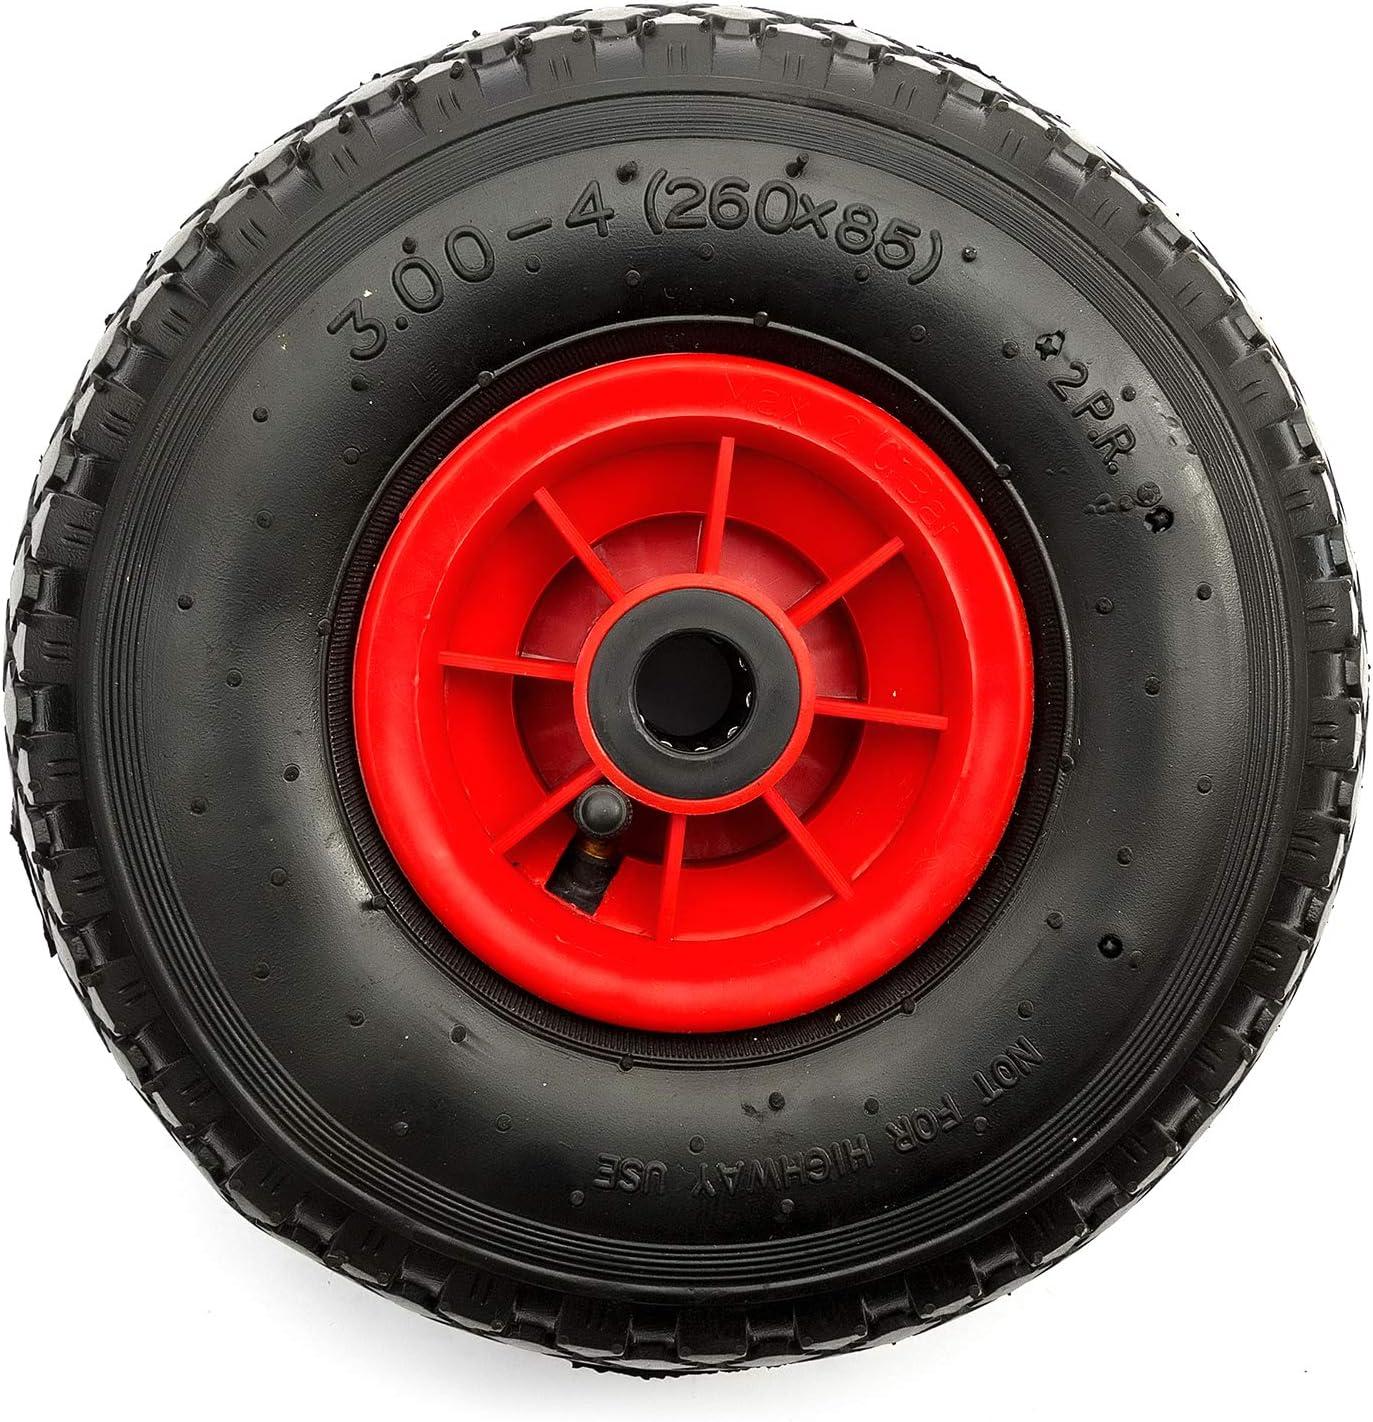 10 Inch Heavy Duty Pneumatic Wheel /& Tyre 260mm 10 Sack Hand Truck Bent Valve